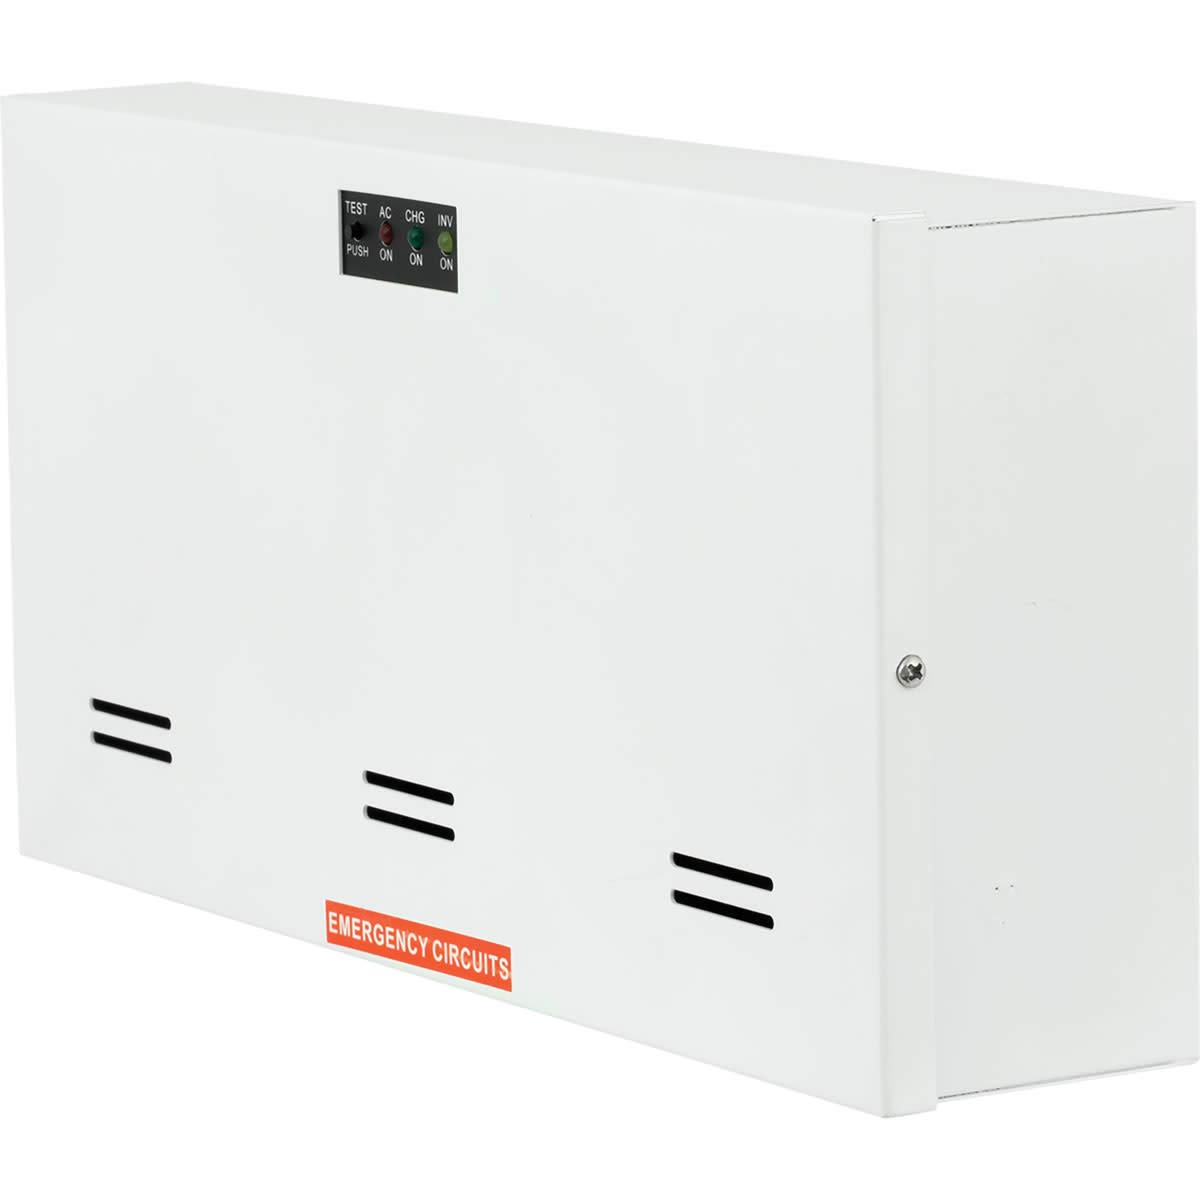 Progress Commercial PECLB-32-30-S Micro Inverter, White